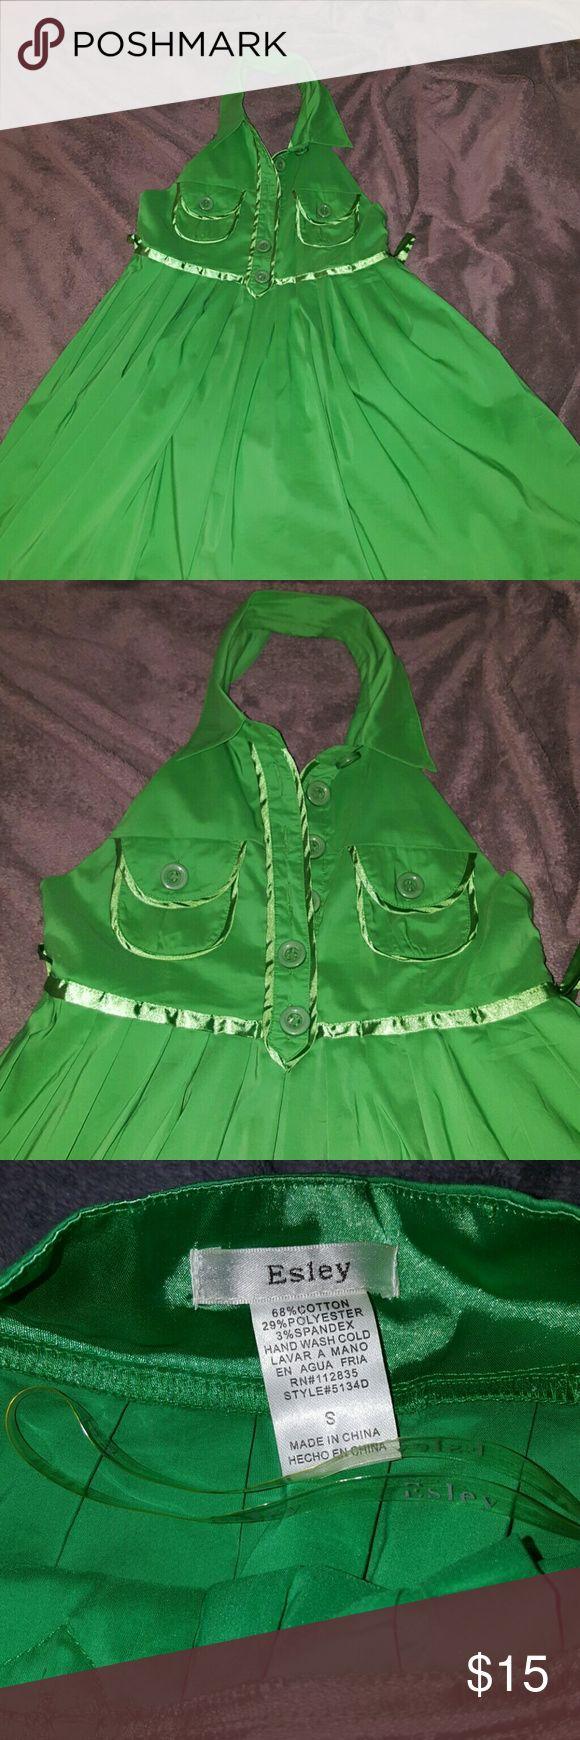 Women's halter dress KELLY GREEN halter tops dress Esley Dresses Mini